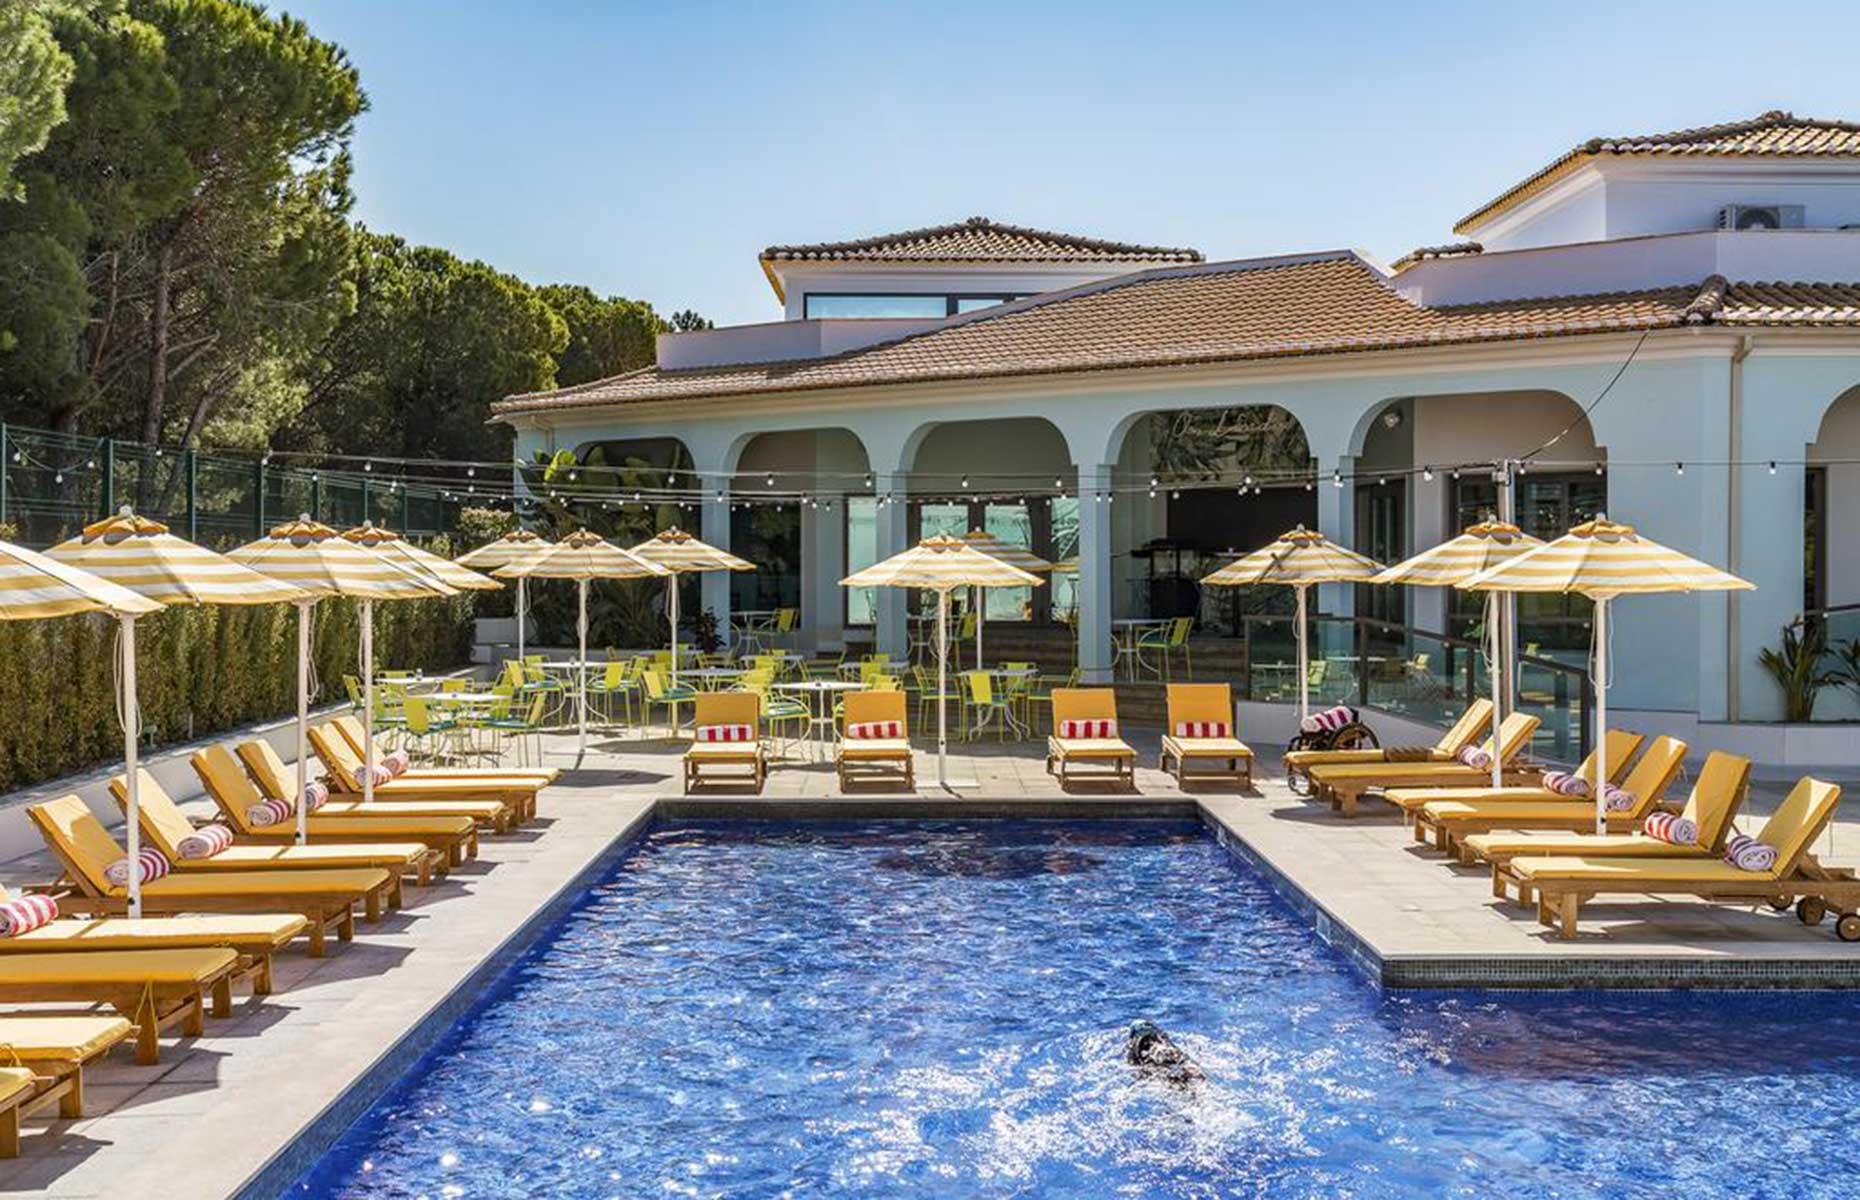 The Magnolia hotel, Portugal's Algarve (Image: The Magnolia Hotel/booking.com)